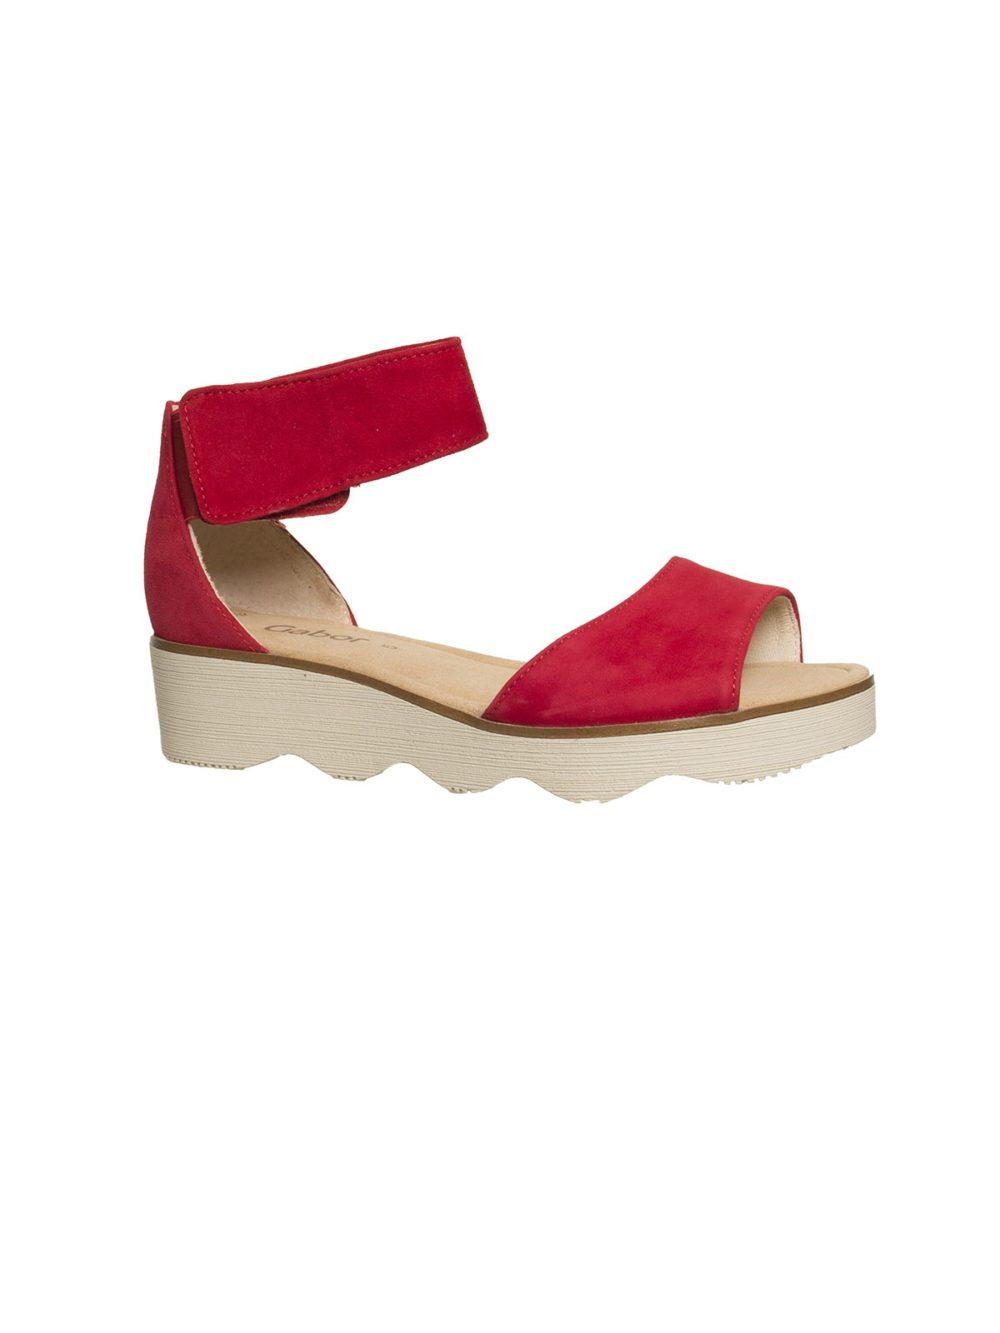 Jazz Sandal Gabor Katie Kerr Women's Sandals